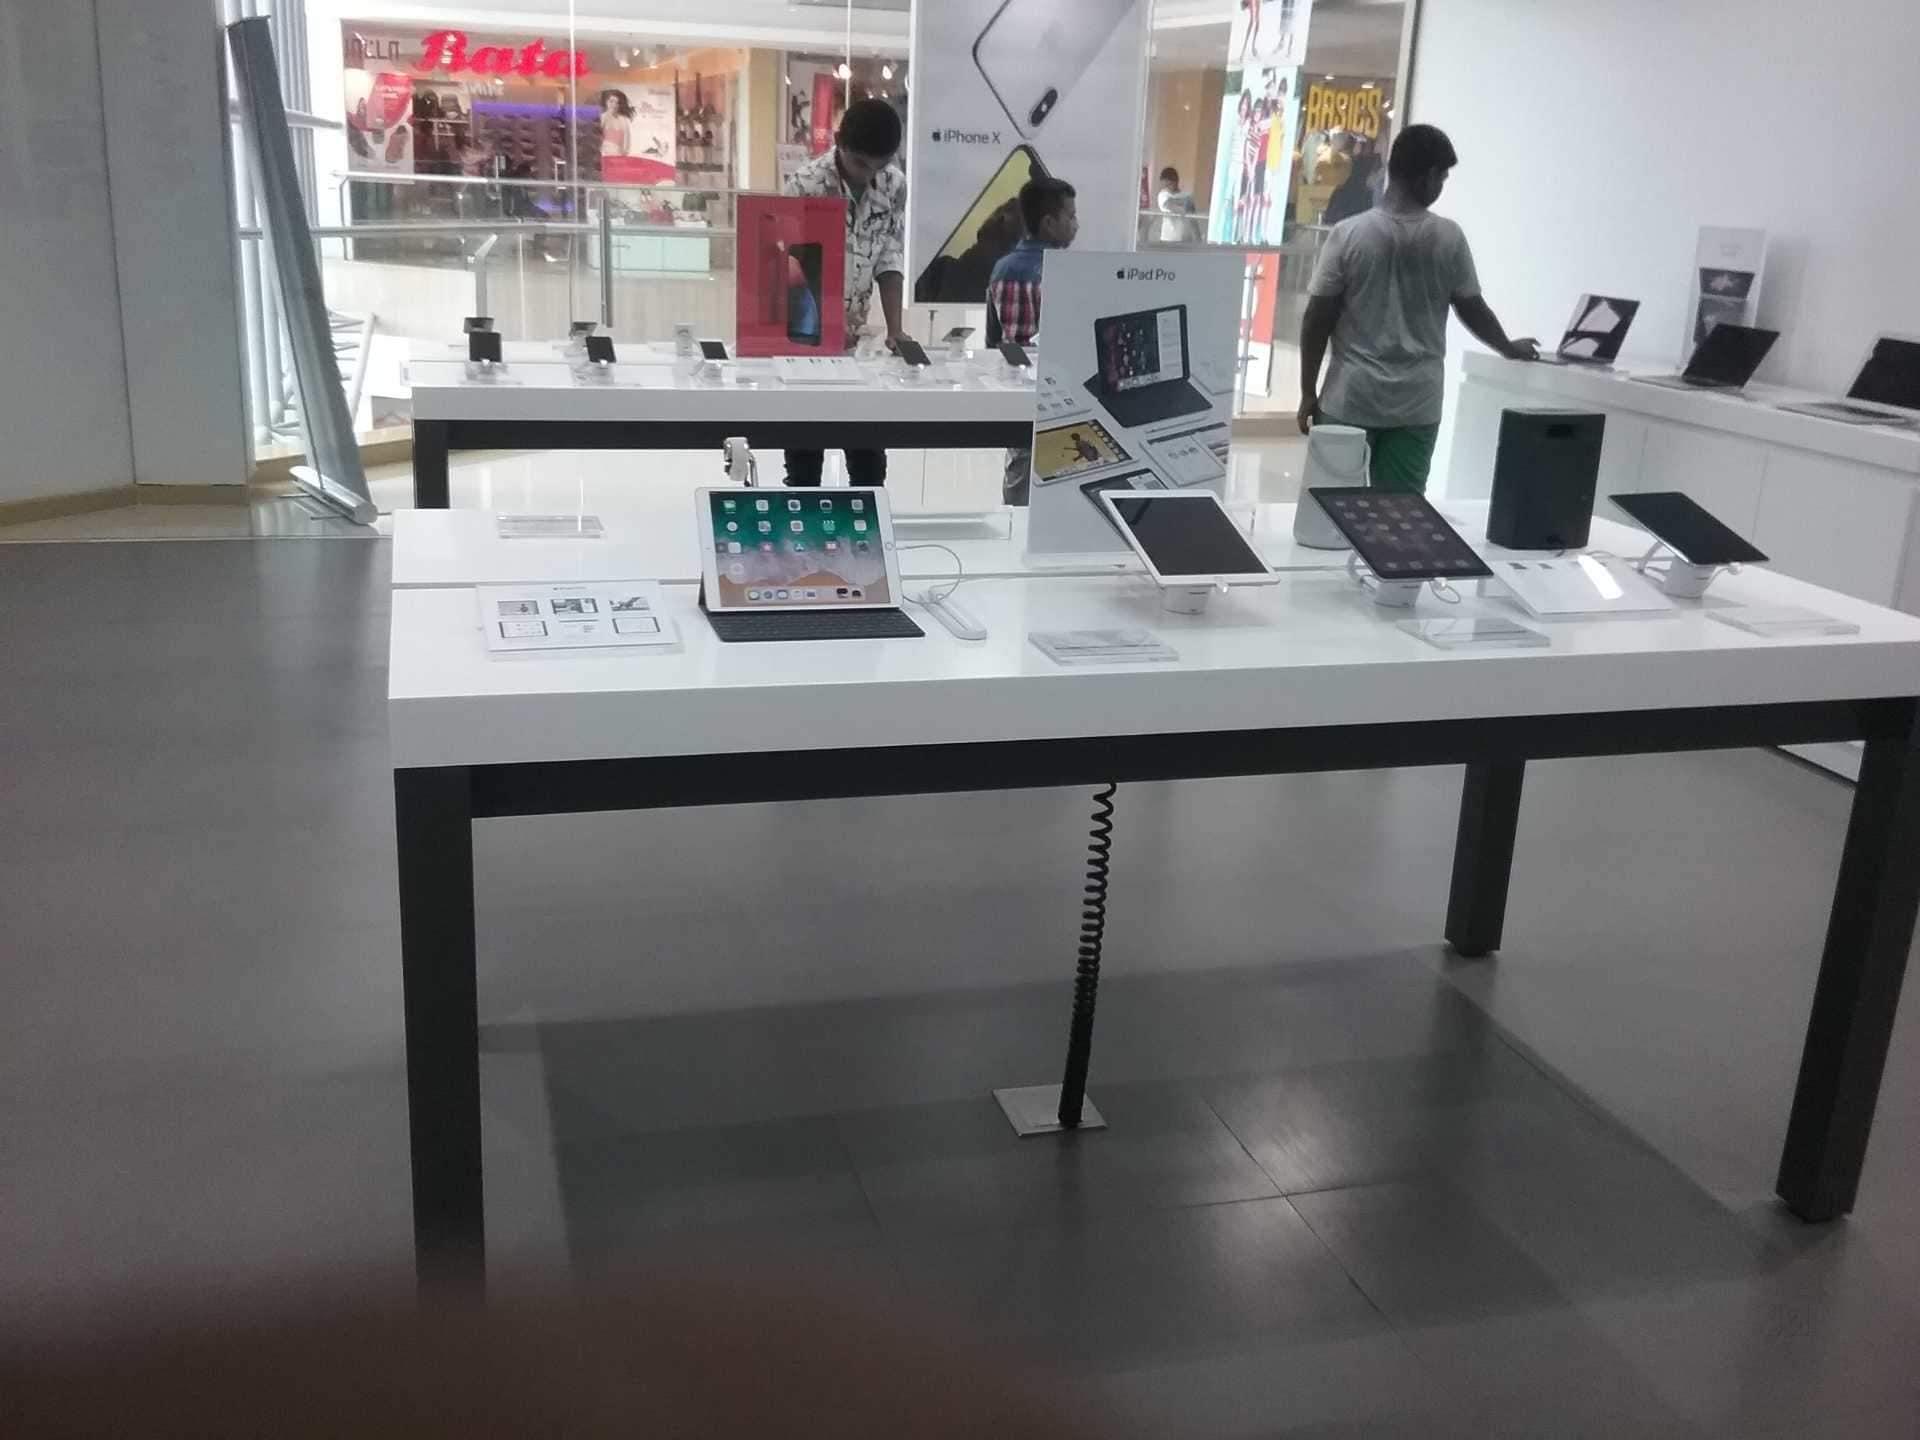 Top 10 Apple Laptop Dealers in Pondicherry - Best Apple